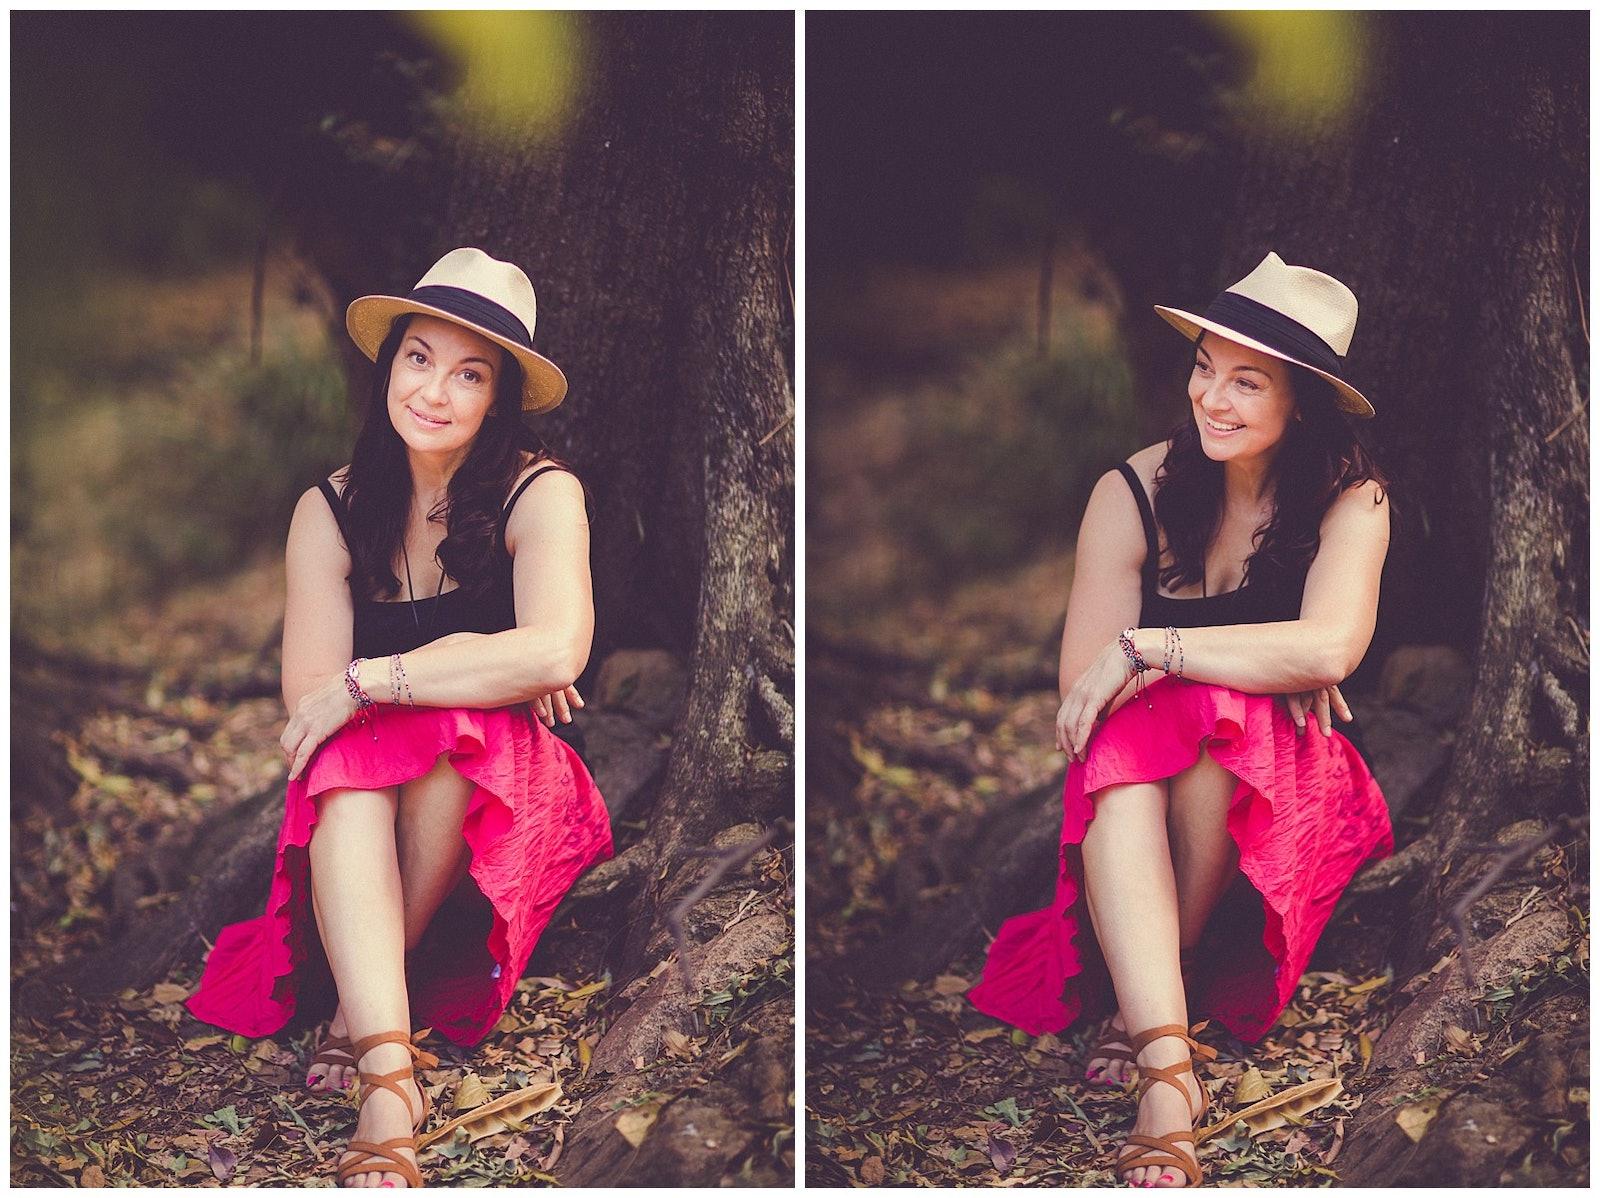 Brisbane online dating  Photos by Sheona Beach